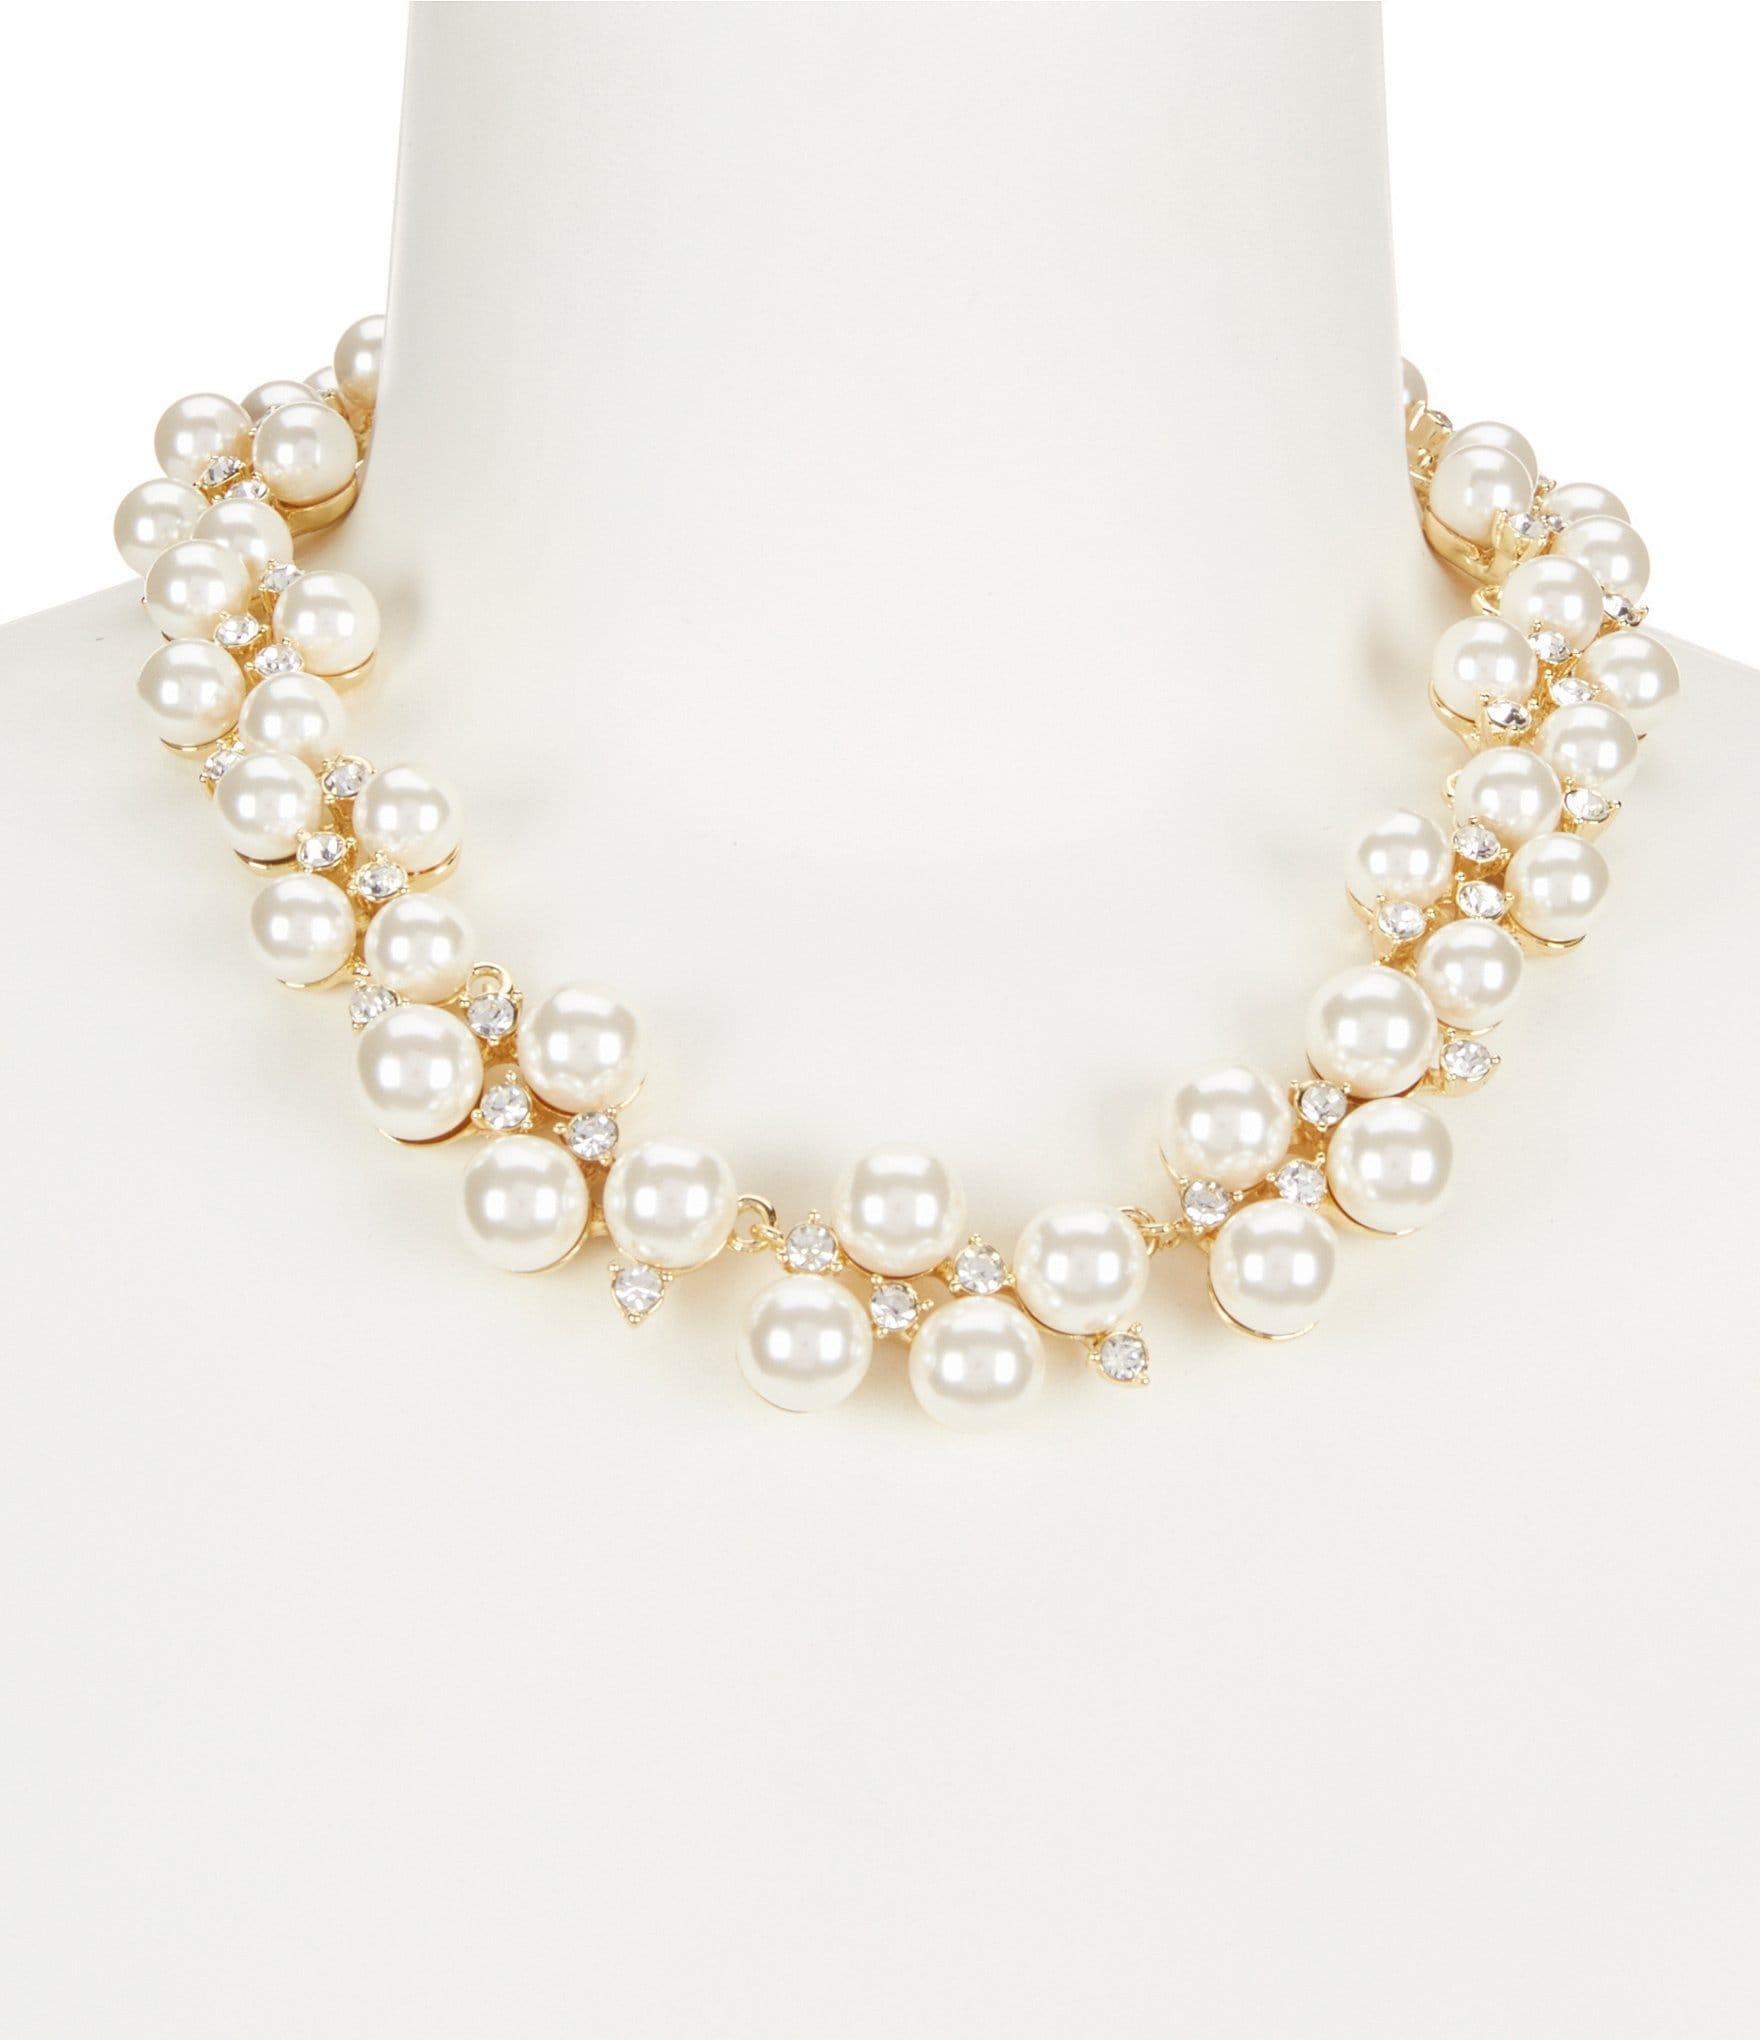 38f66ac0247b6 Anne Klein Faux-Pearl Collar Statement Necklace